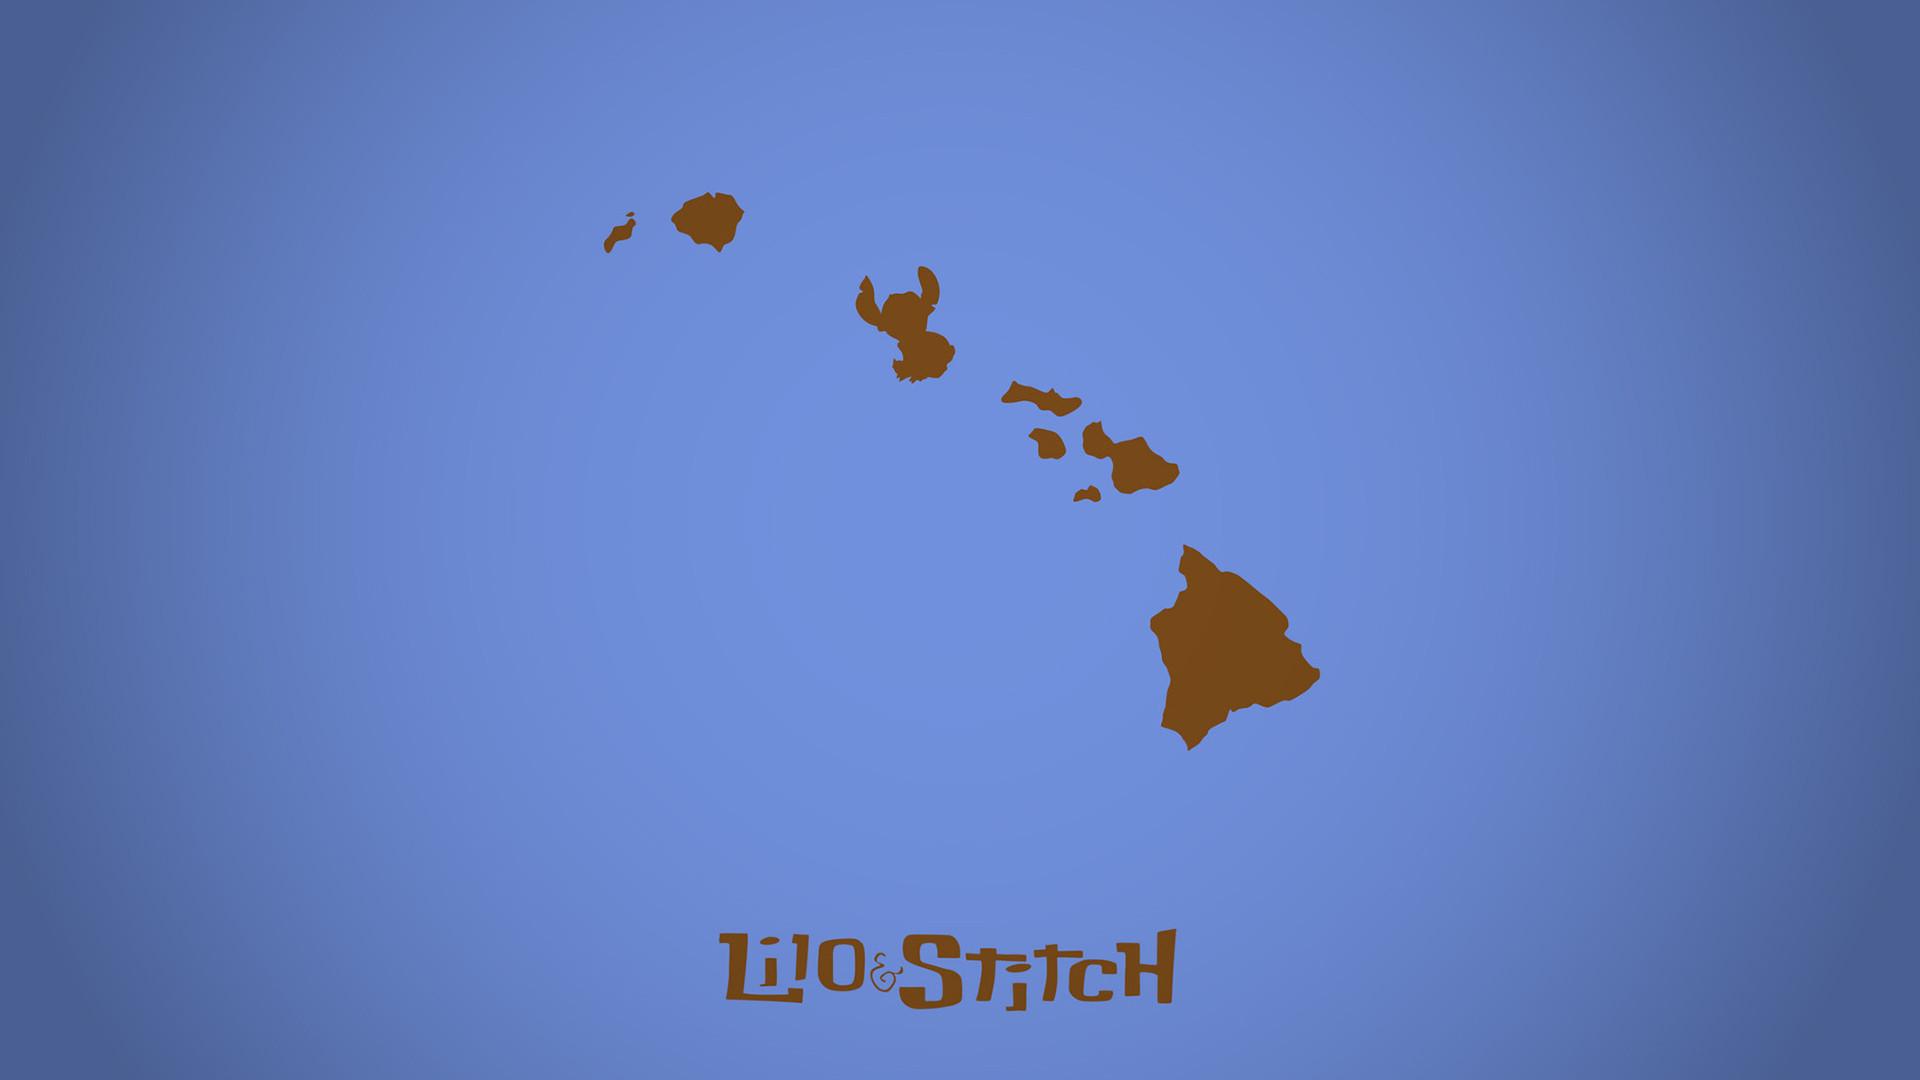 Desktop Stitch Background Hd 1920x1080 Wallpaper Teahub Io